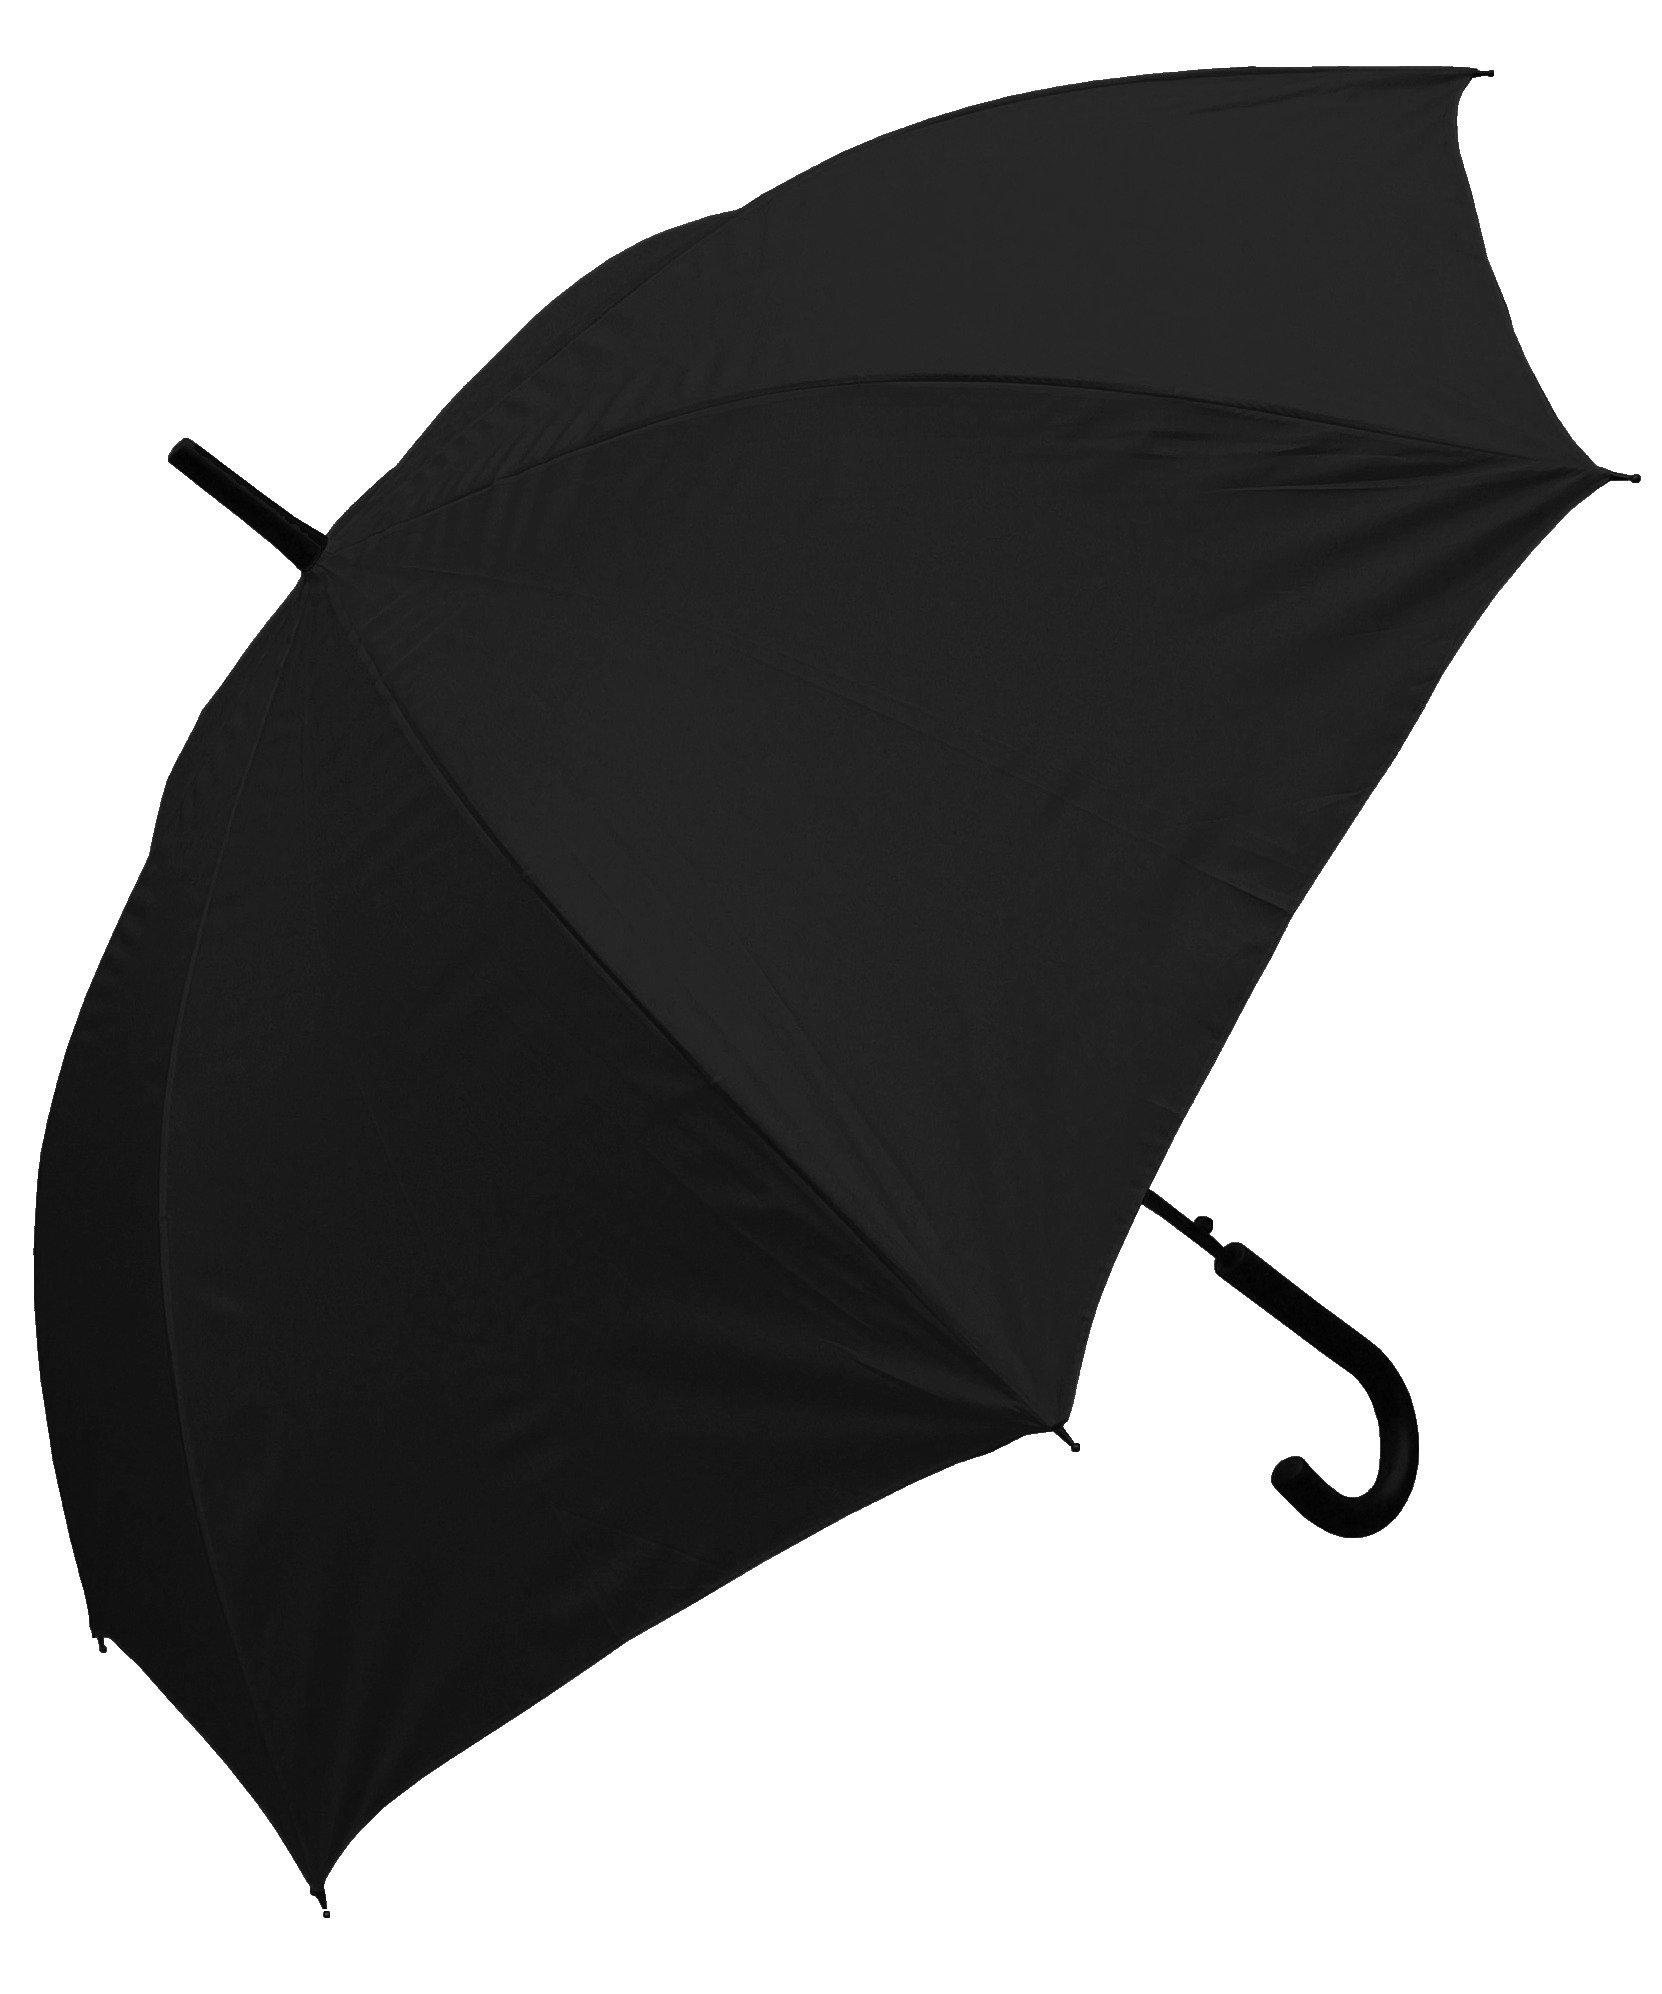 RainStoppers Auto Open European Hook Handle Umbrella, Black, 48-Inch